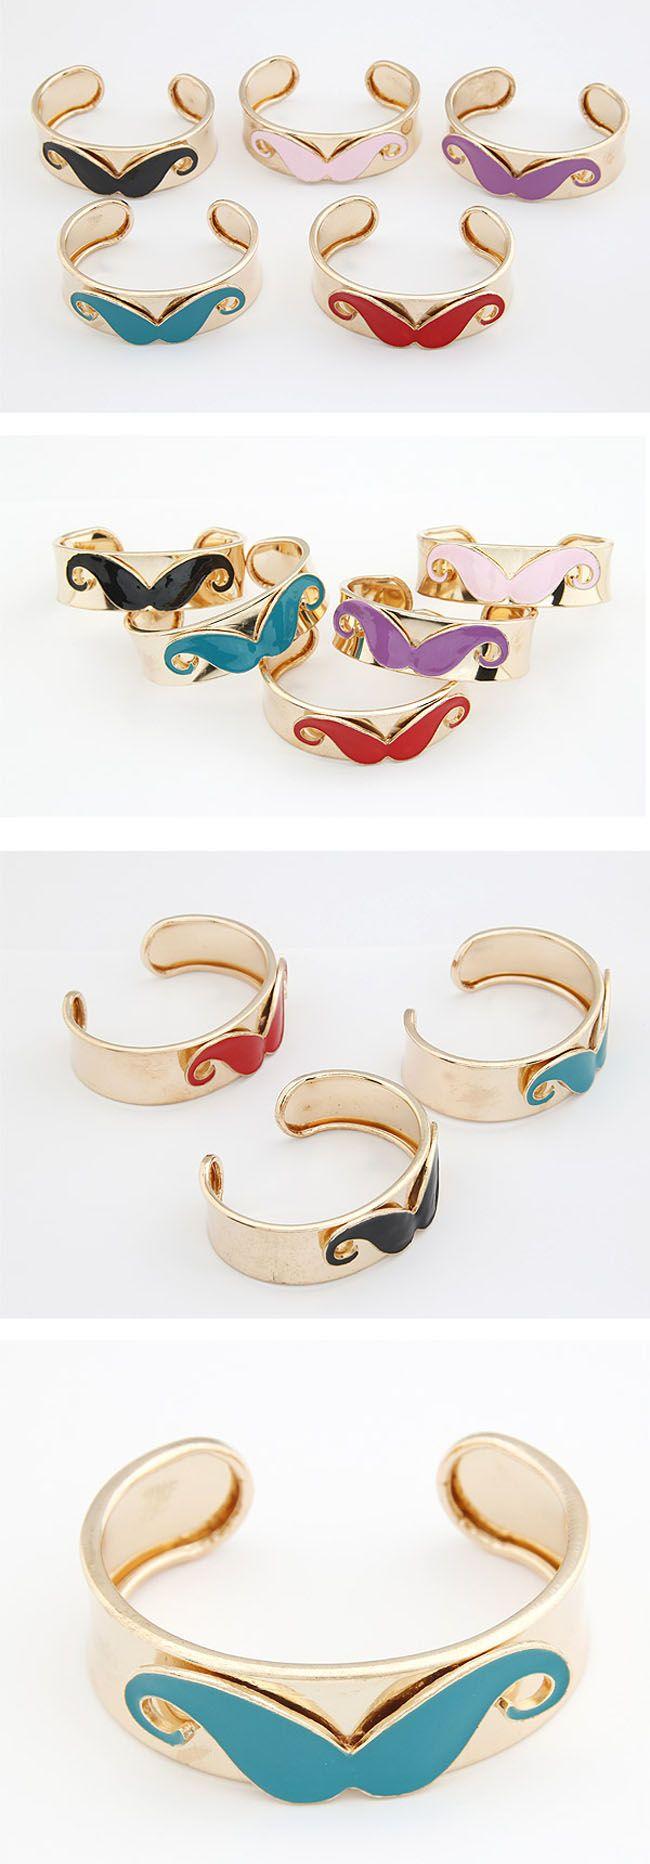 Hot Fashion Jewelry Black Mustache Gold Plated Leaf Bangle Bracelet